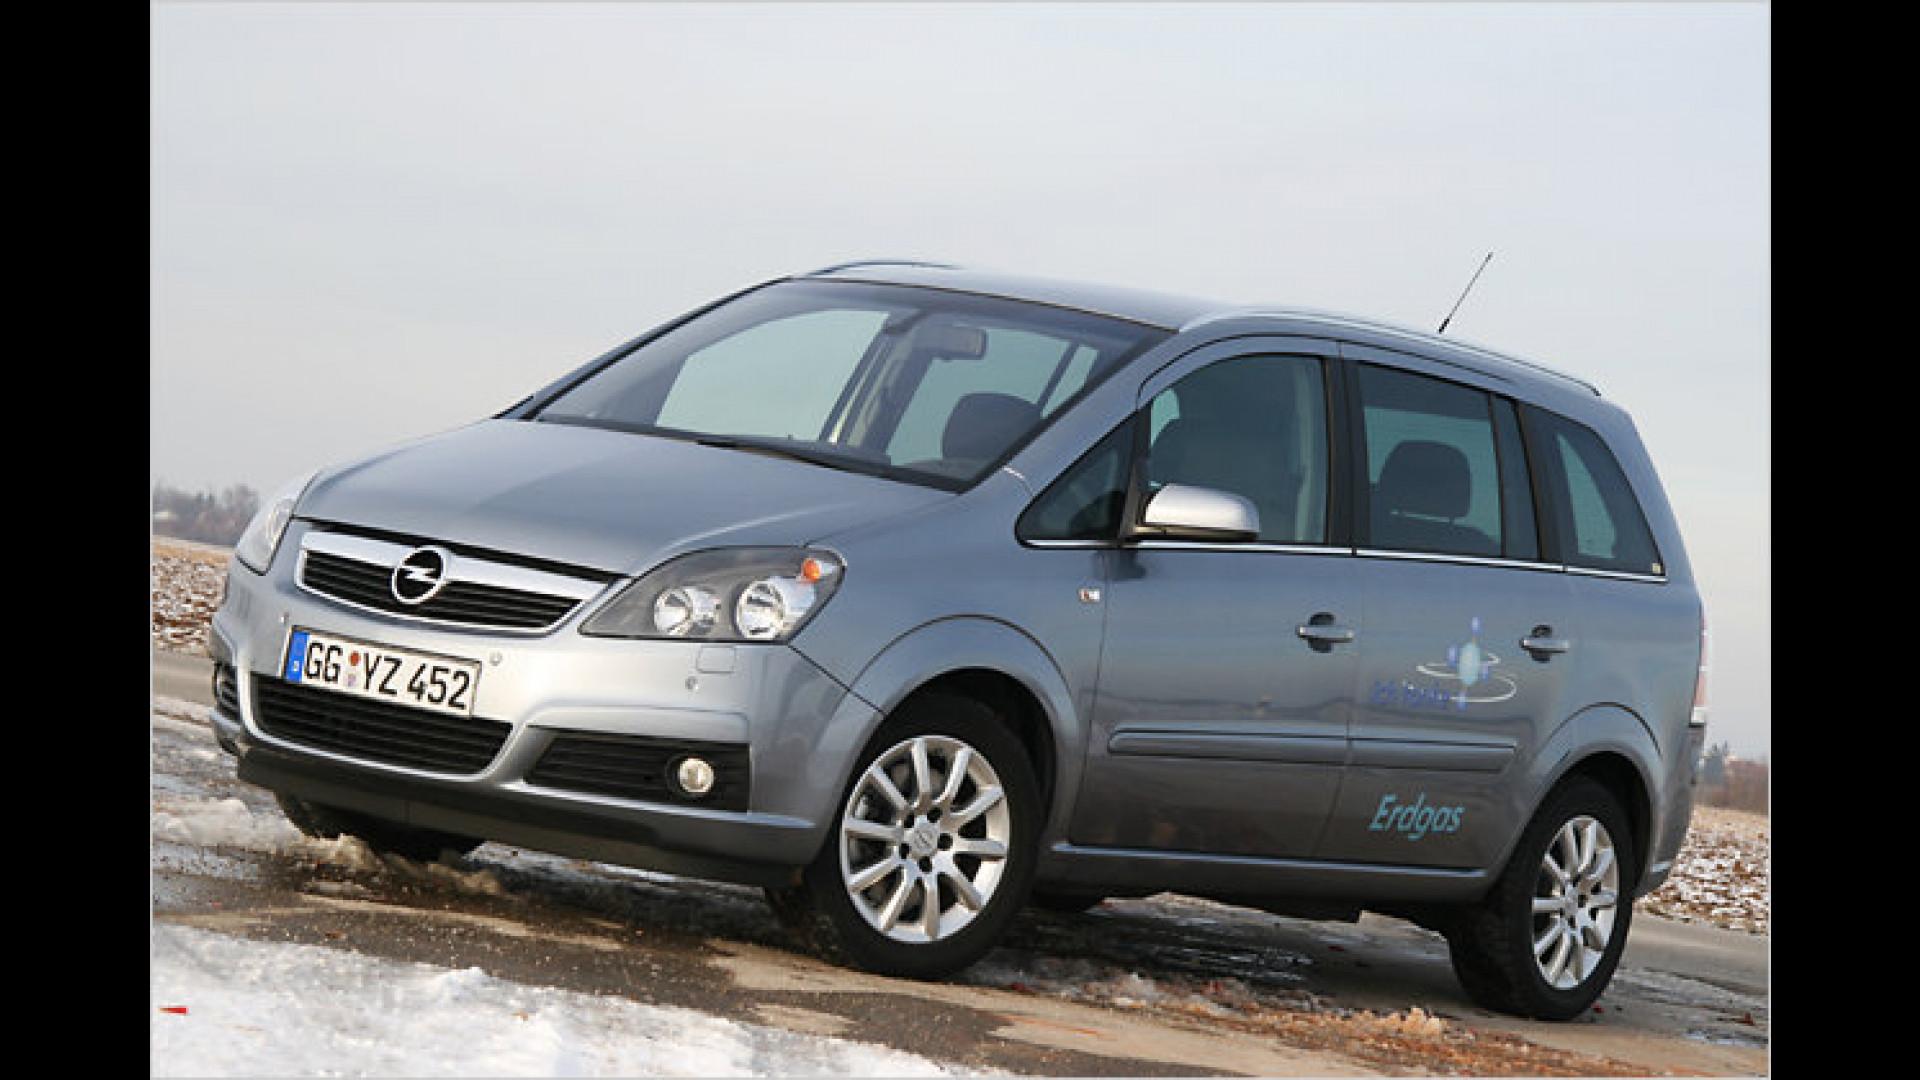 Opel Zafira 16 Cng Ecoflex Einmal Ordentlich Gas Geben